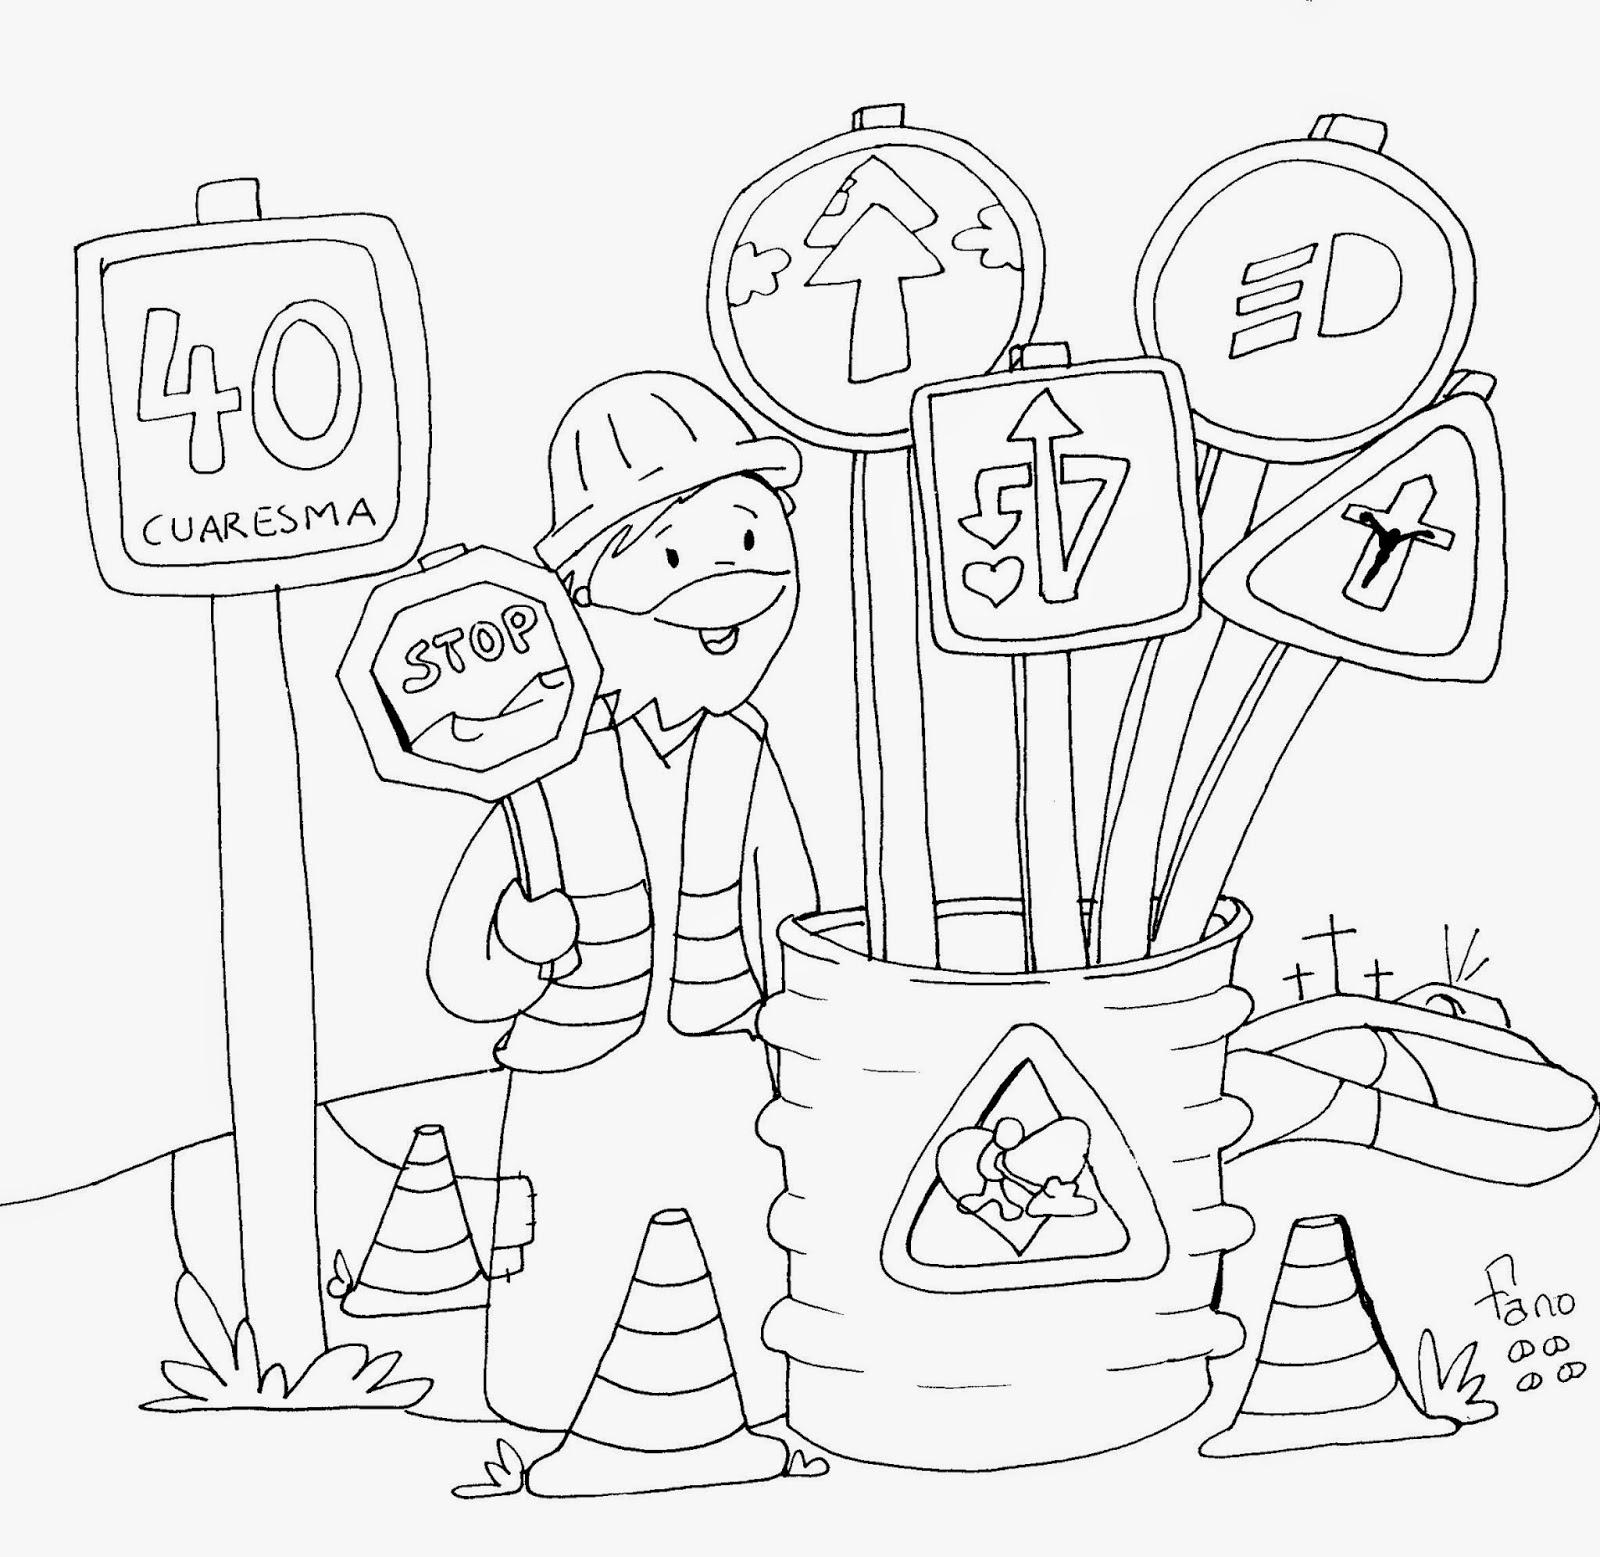 La Catequesis (El blog de Sandra): Dibujos de Patxi Fano para ...